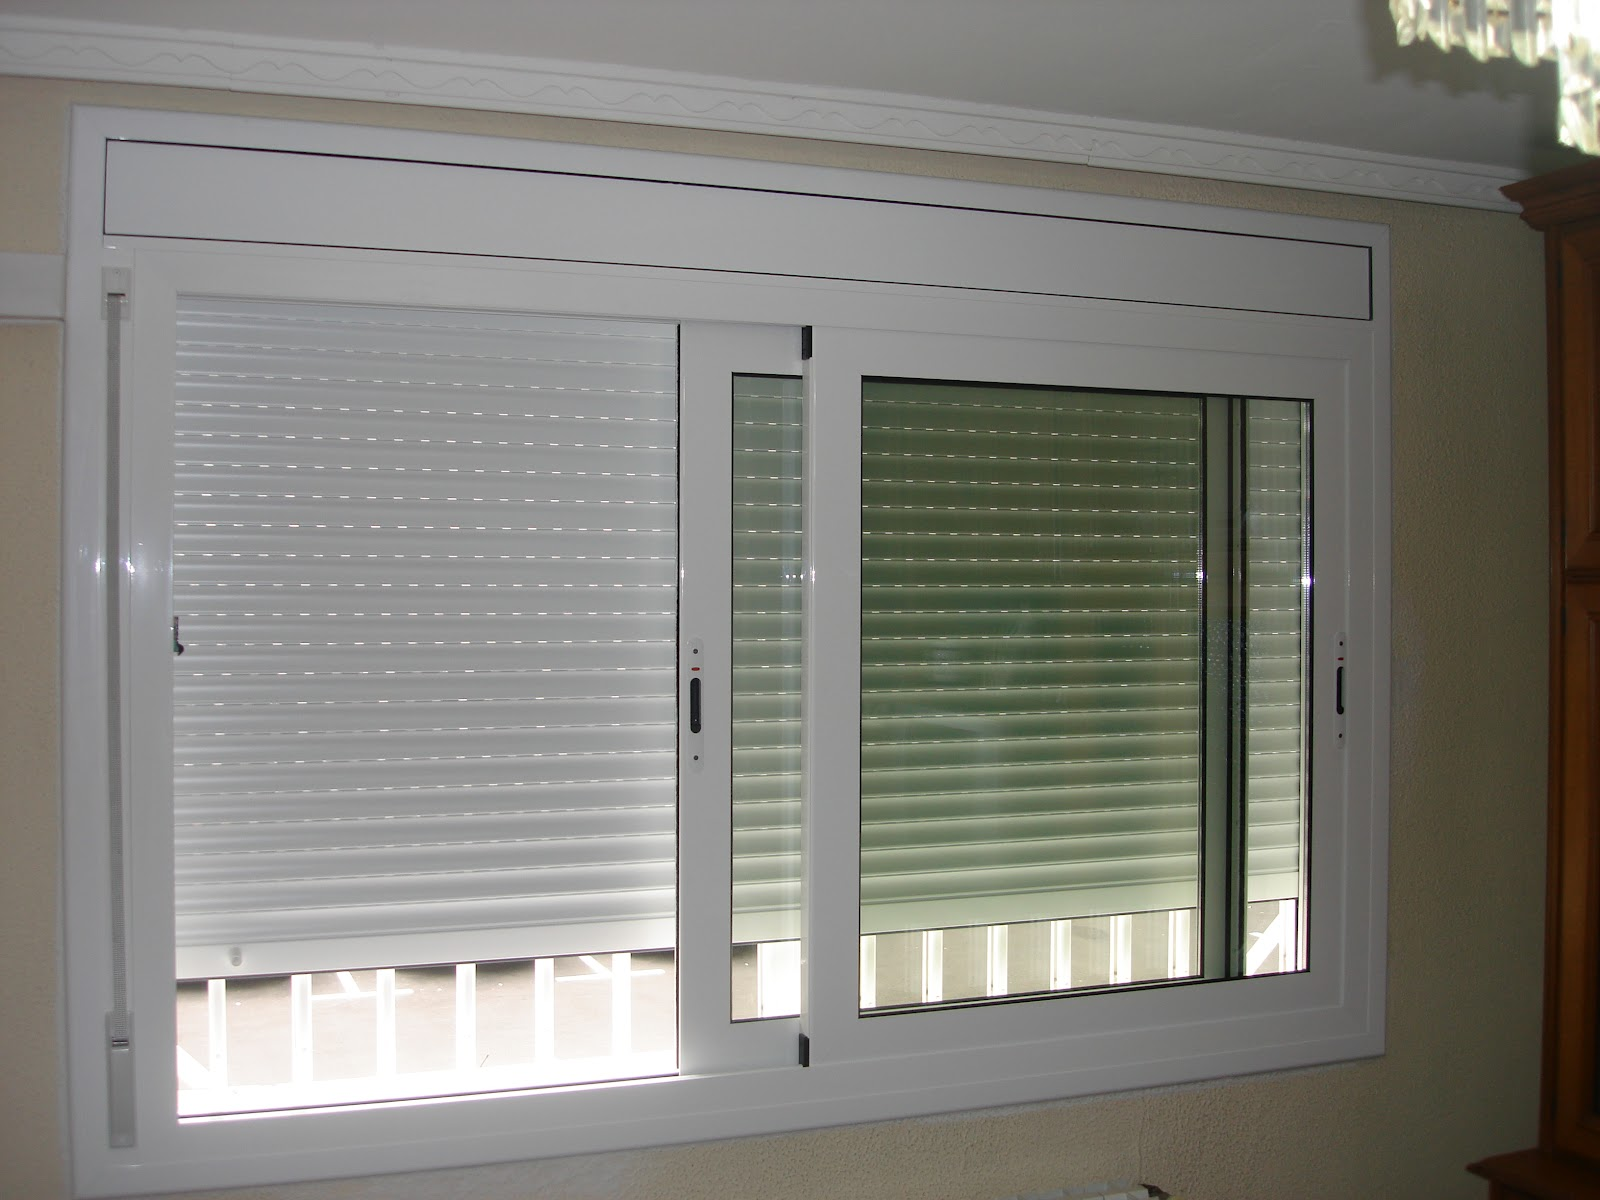 Mamparas Para Baño Bariloche: ventanas de aluminio persianas mosquiteras mamparas de baño